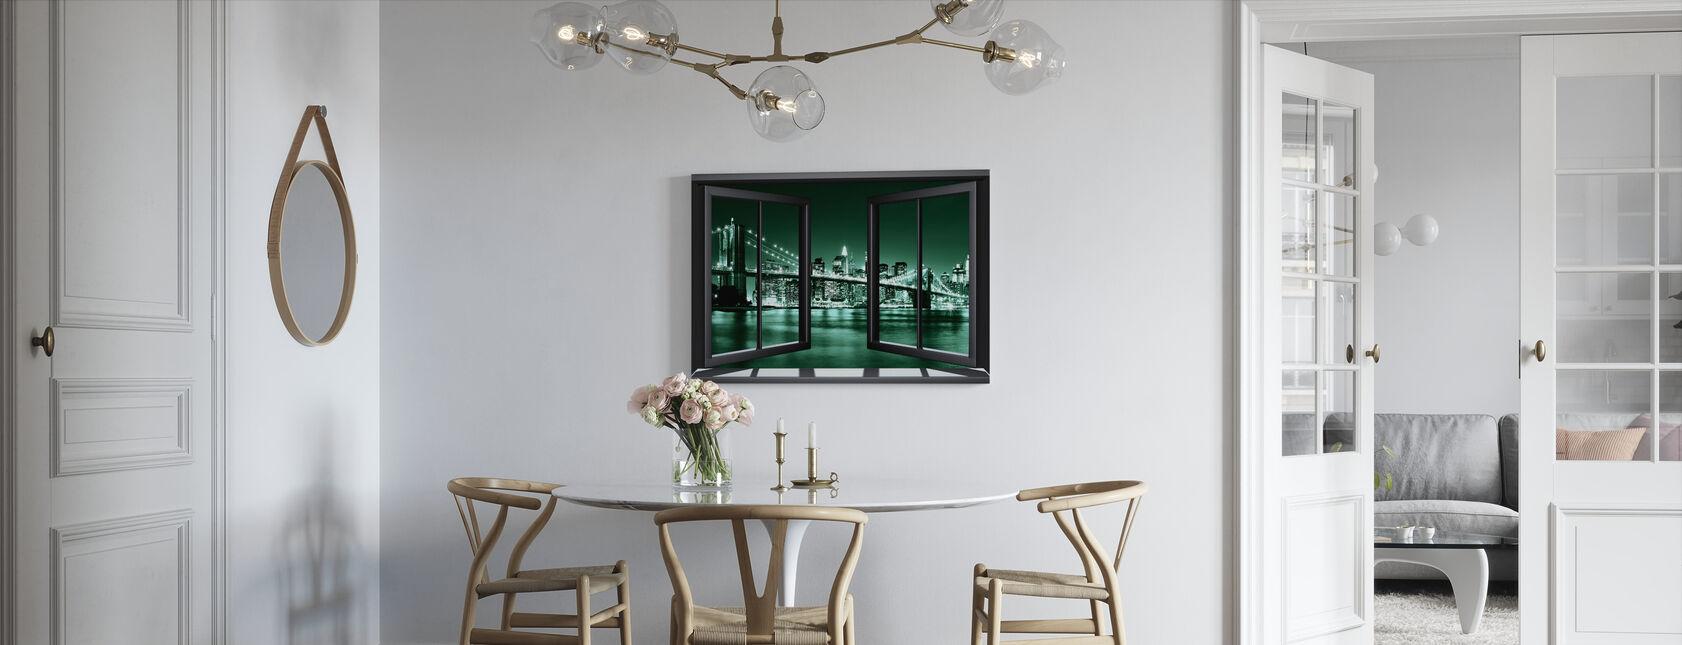 Brooklyn brug door raam - groen - Canvas print - Keuken